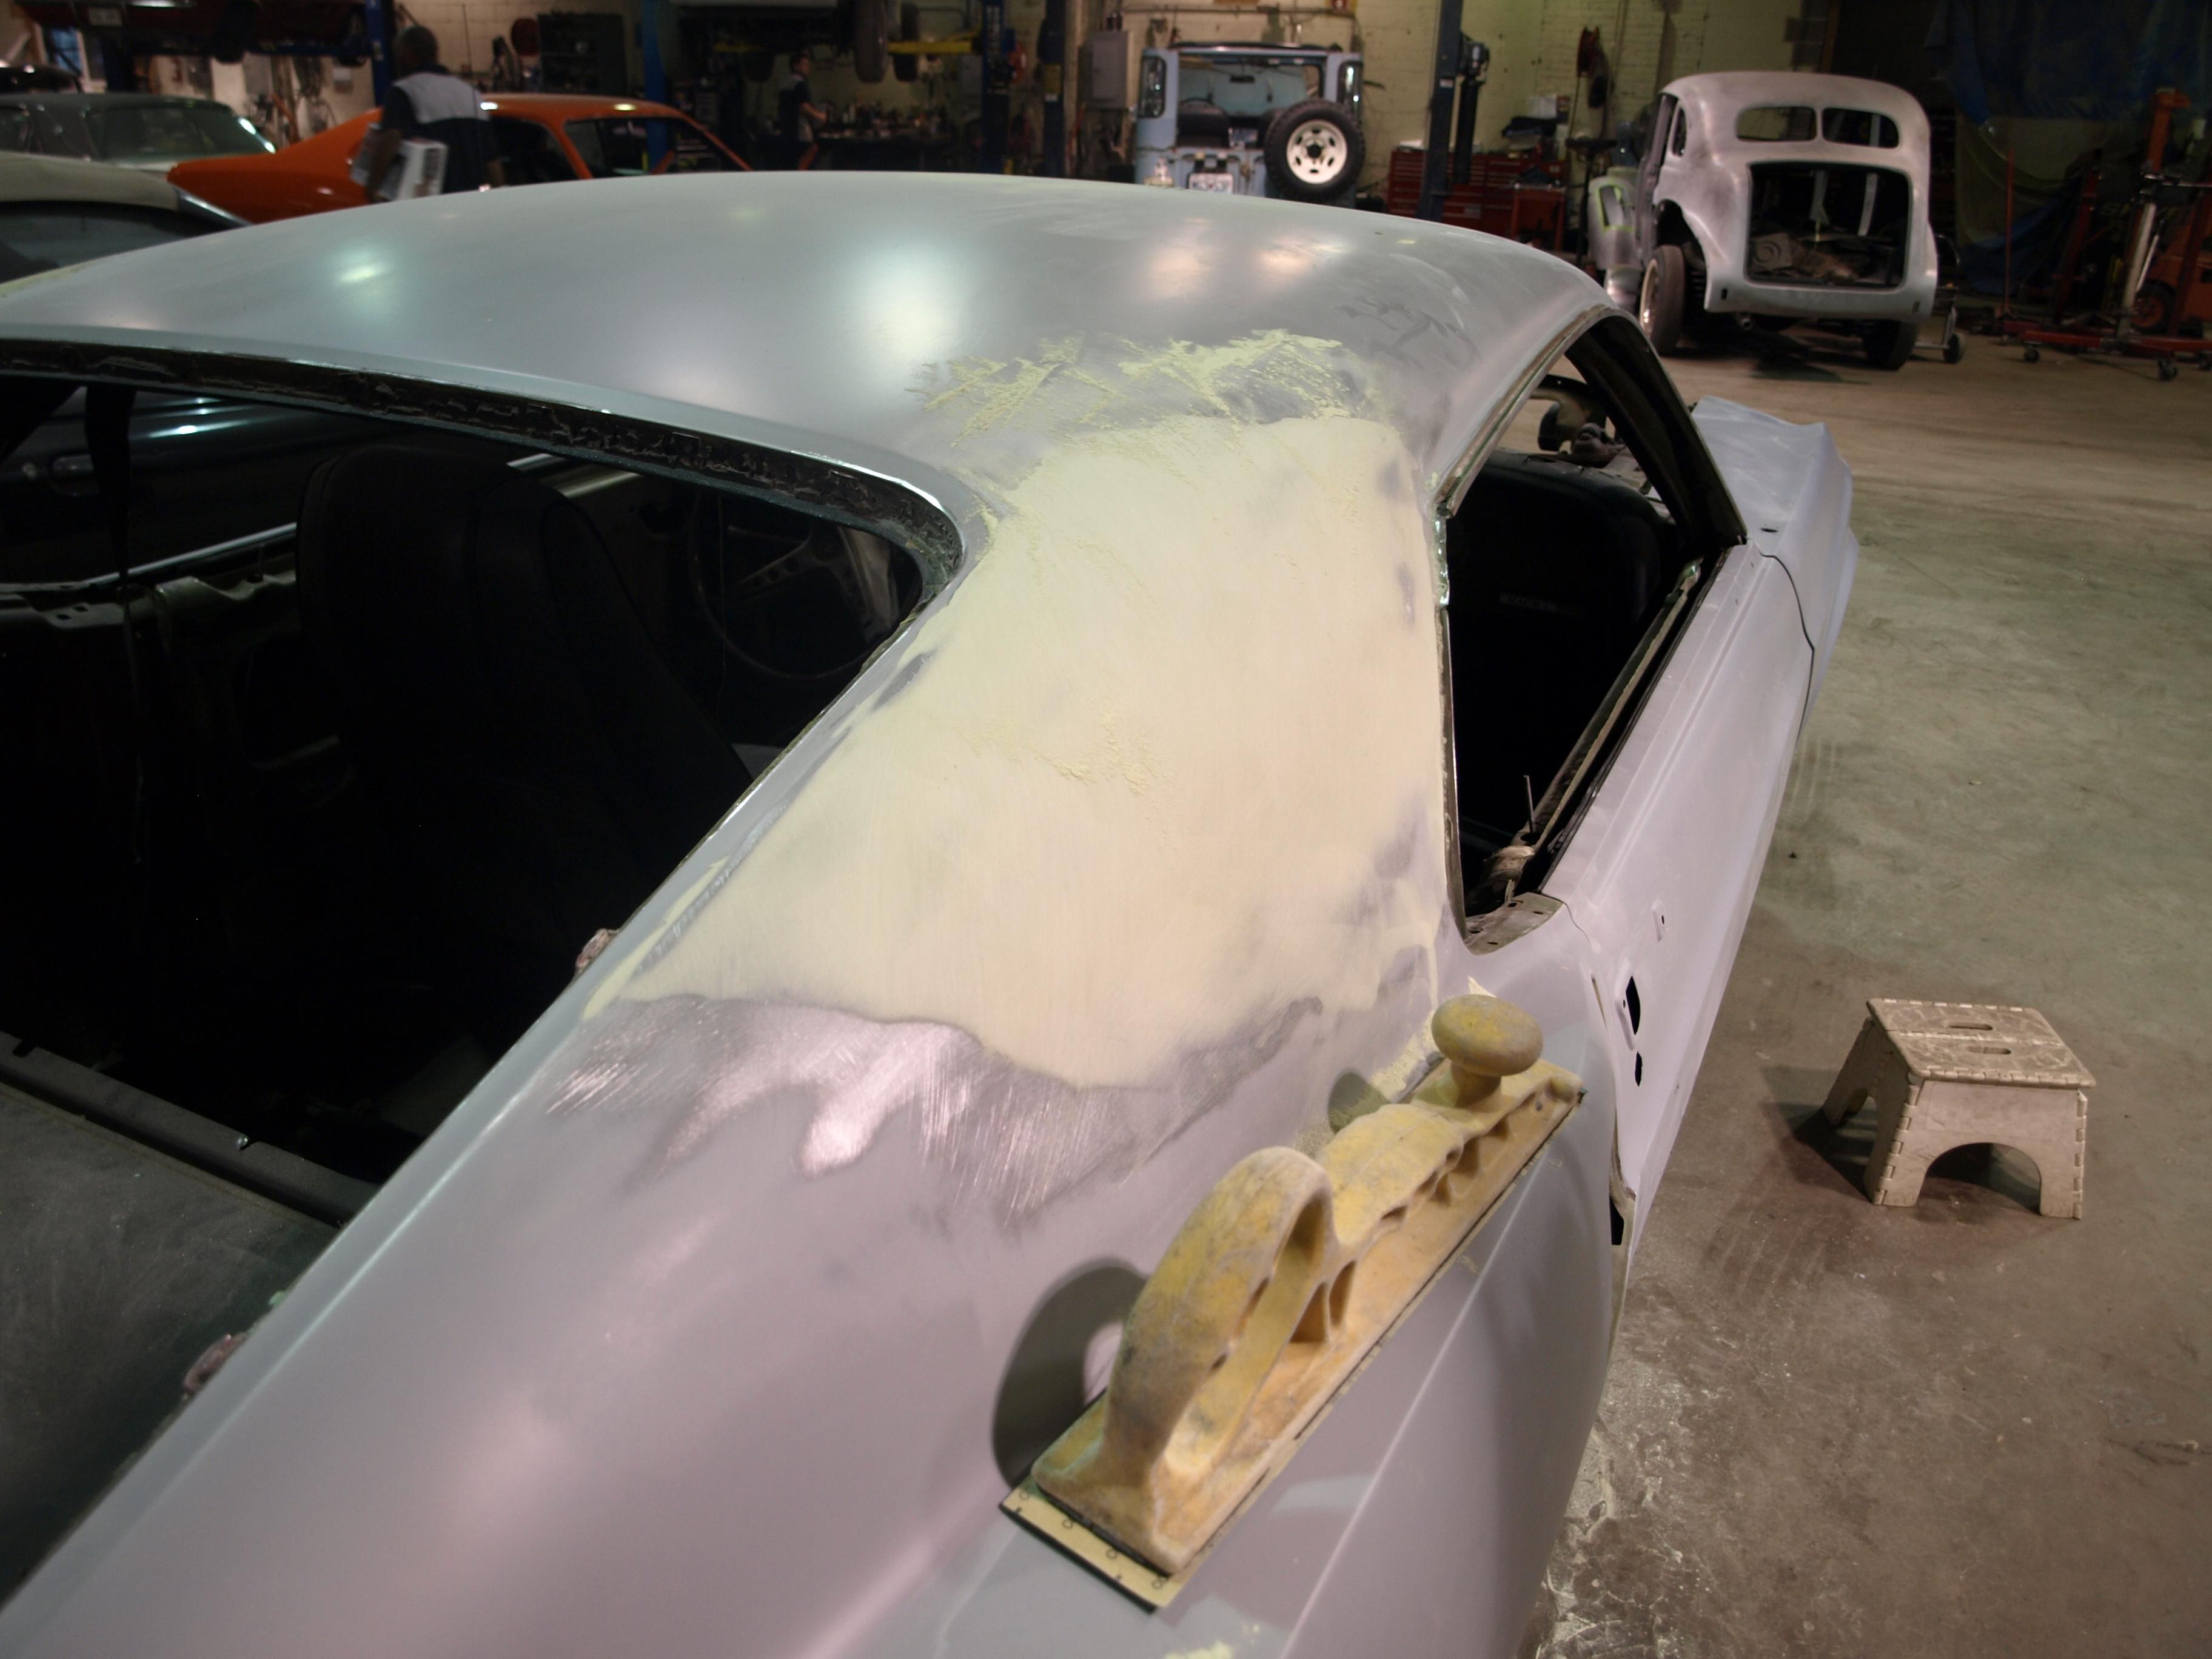 1969 ford mustang mach 1 precision car restoration. Black Bedroom Furniture Sets. Home Design Ideas